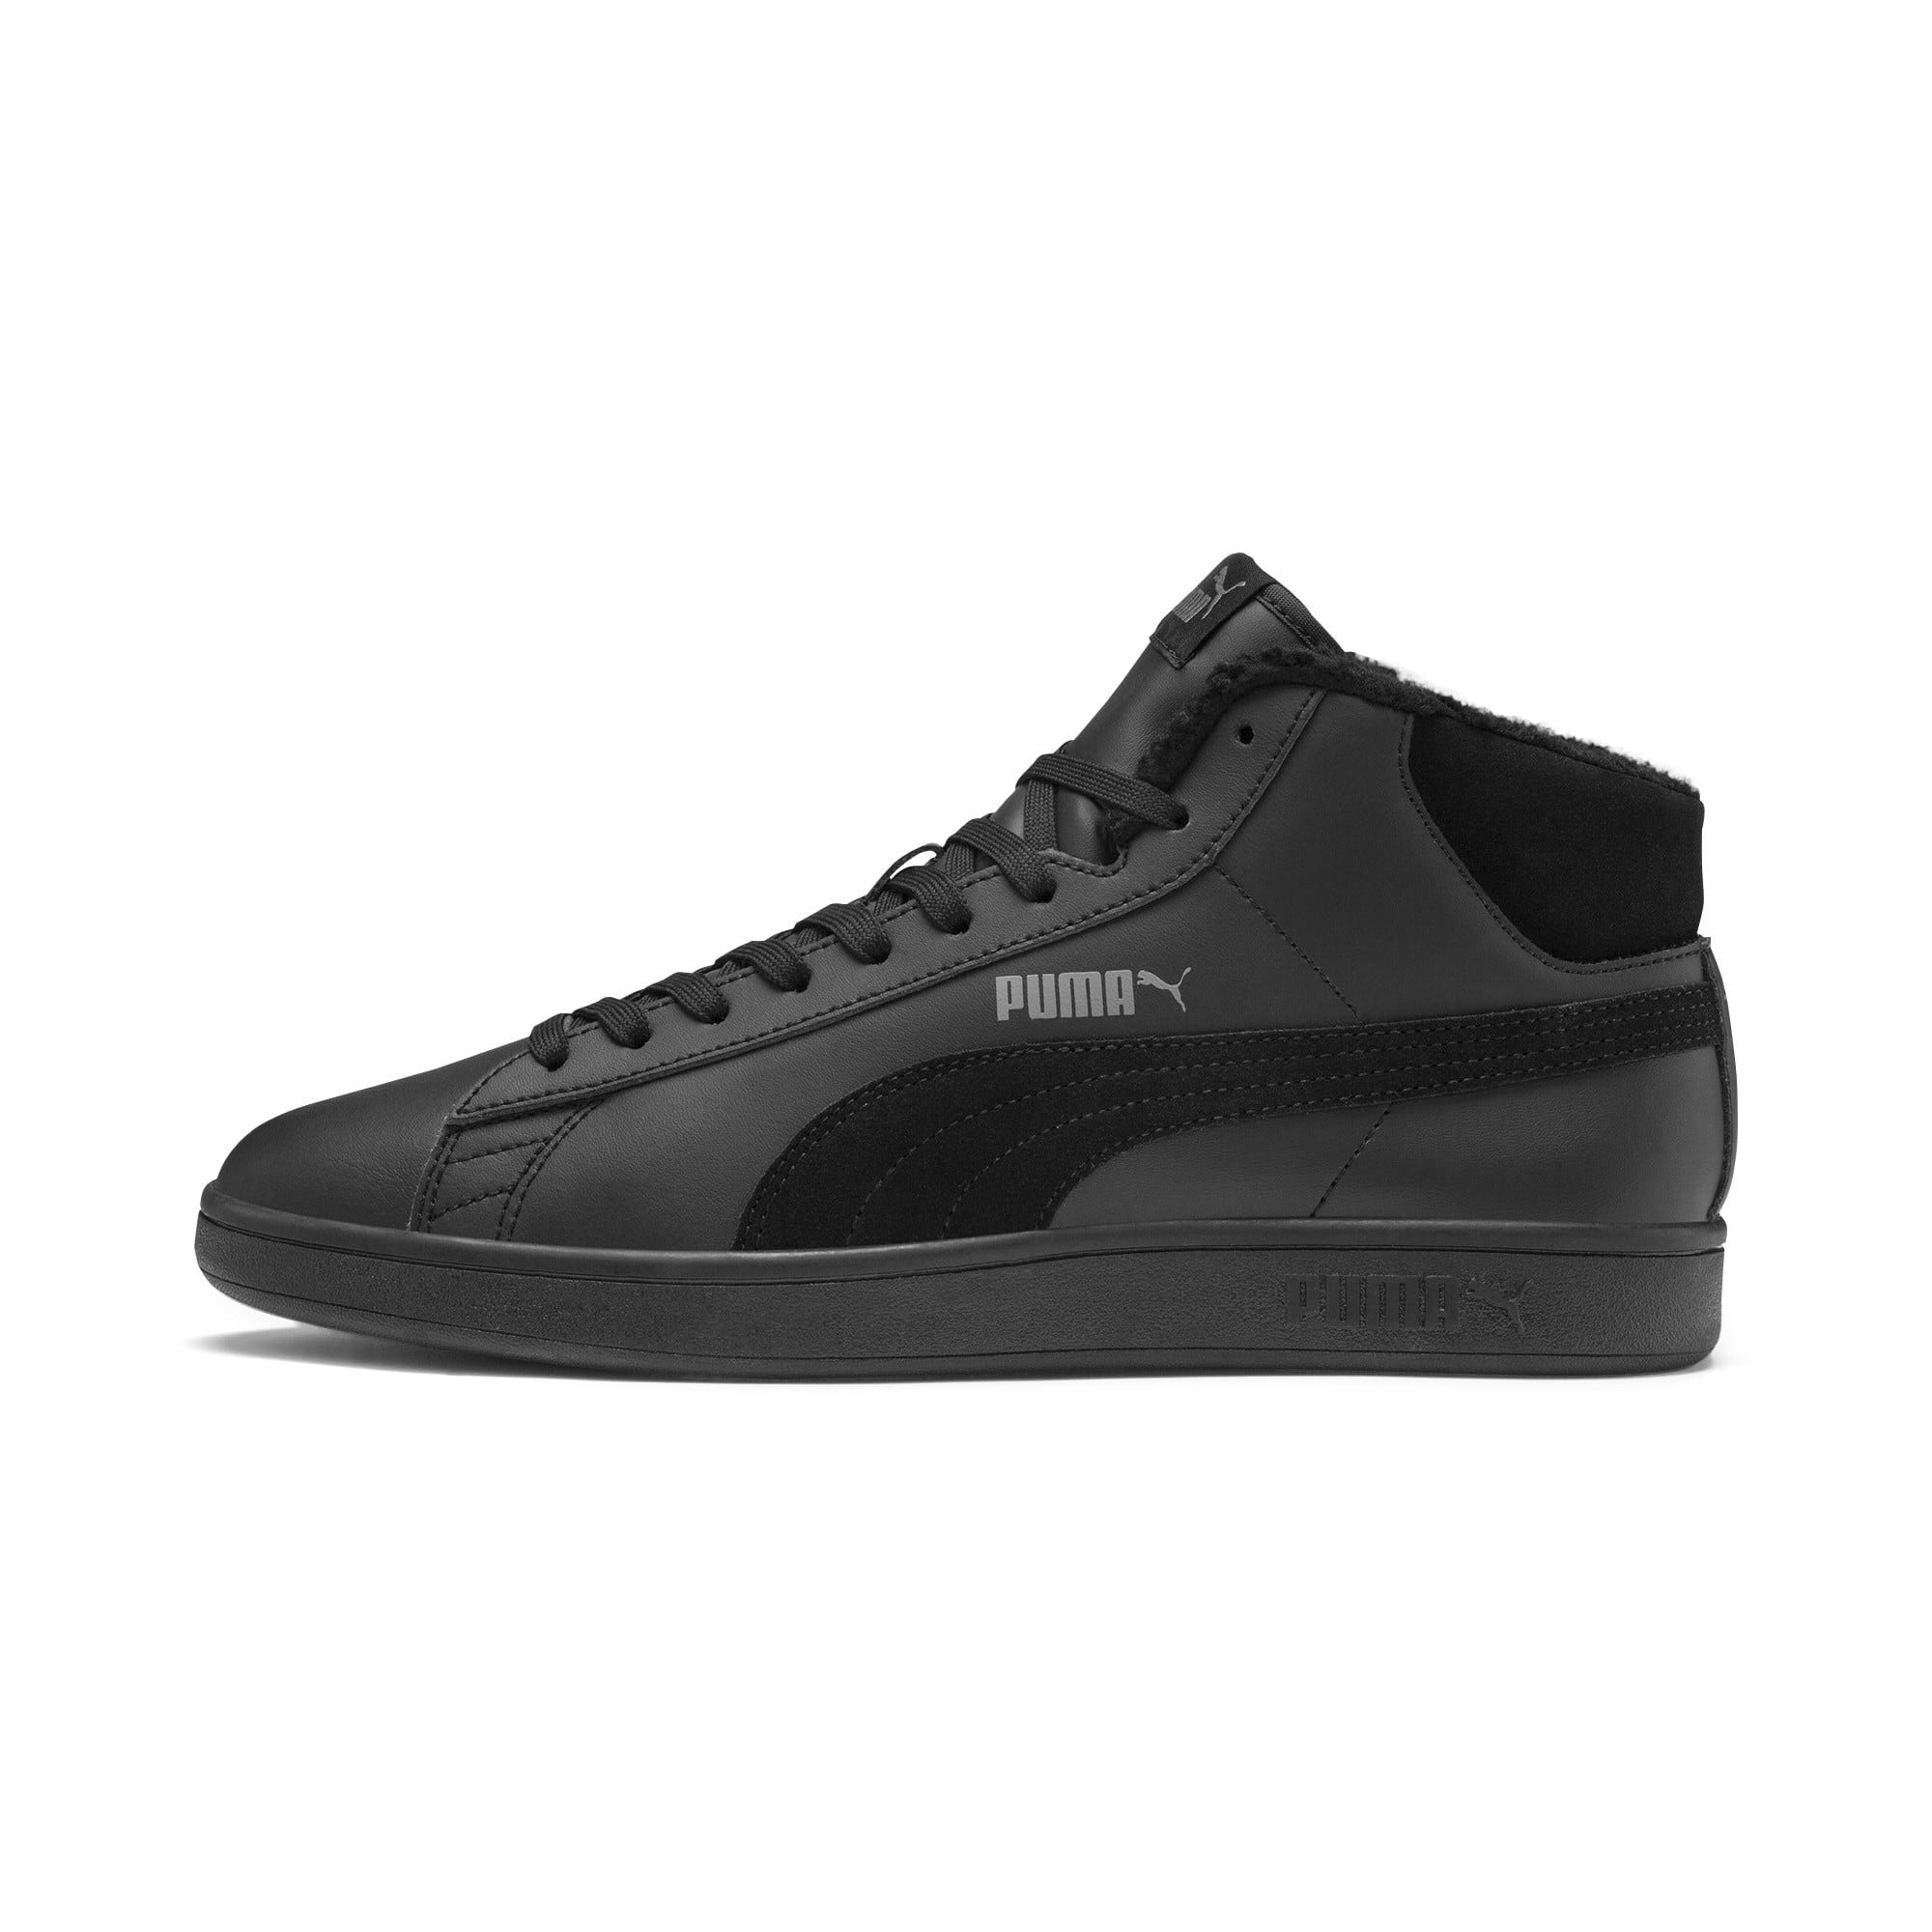 Thumbnail 1 of Smash v2 Mid Winterized Leather High Tops, Puma Black-CASTLEROCK, medium